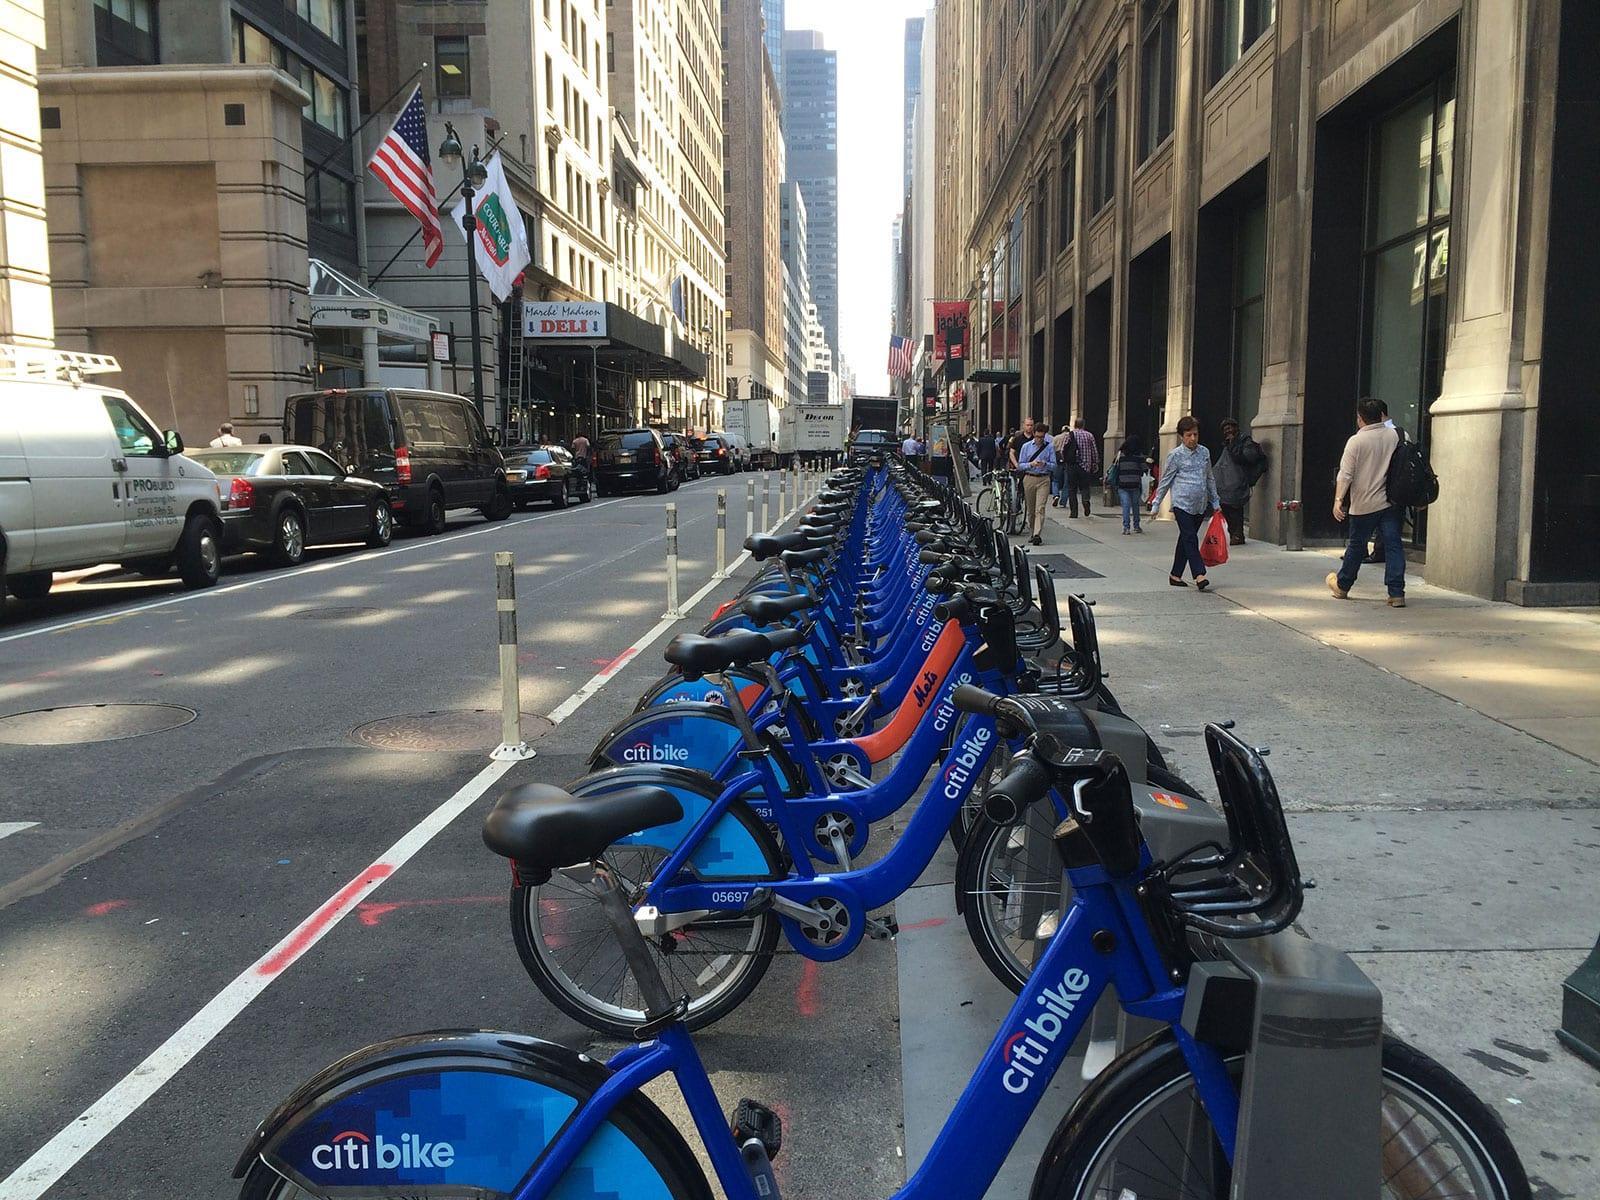 Citi_Bikes_New York_Erfahrungen_170322141628001